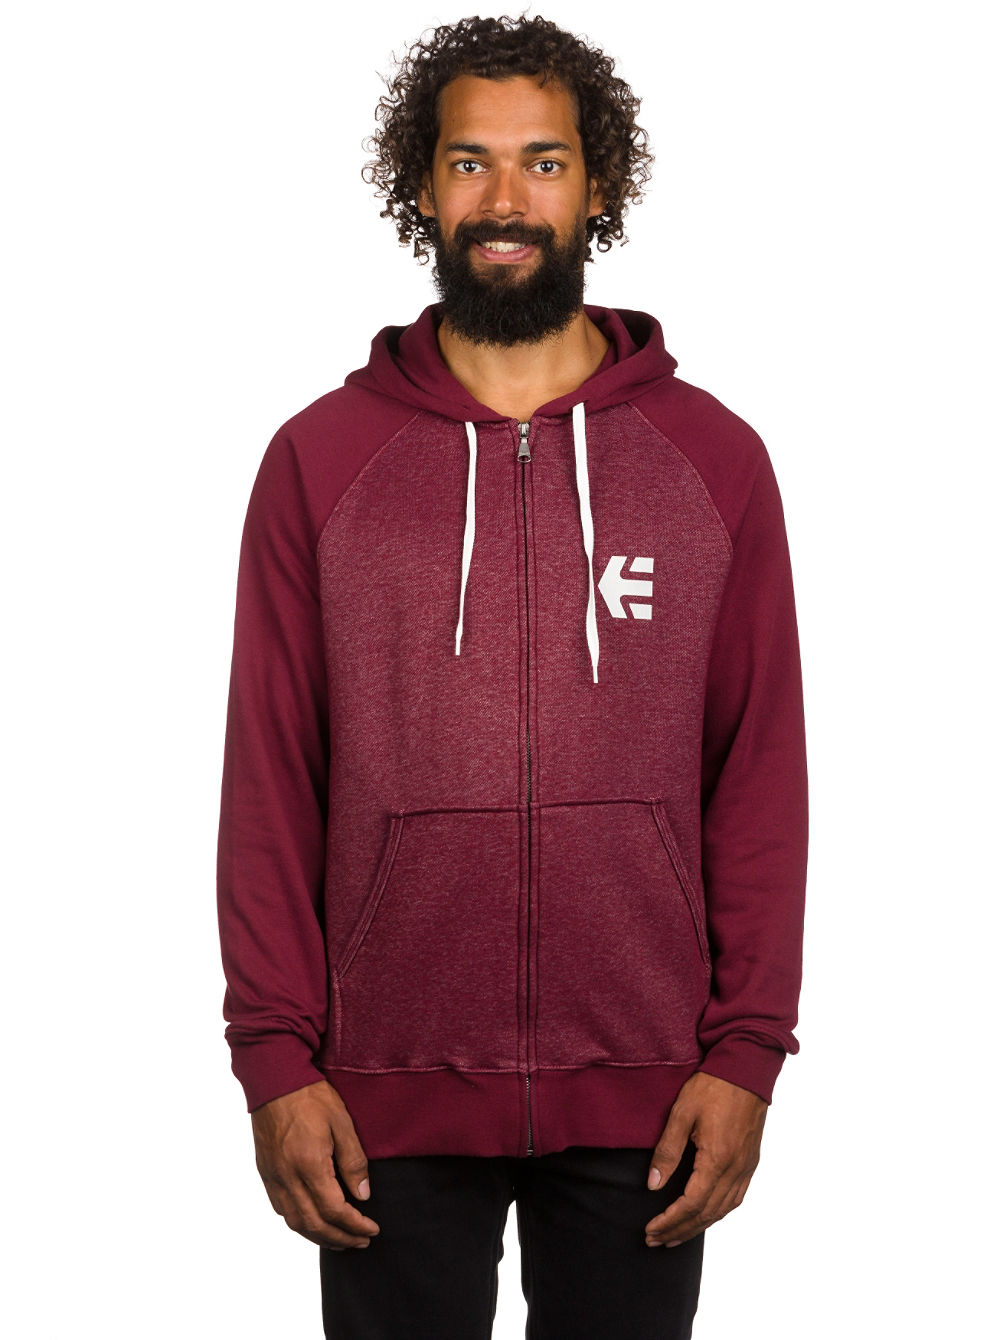 etnies-e-corp-zip-hoodie